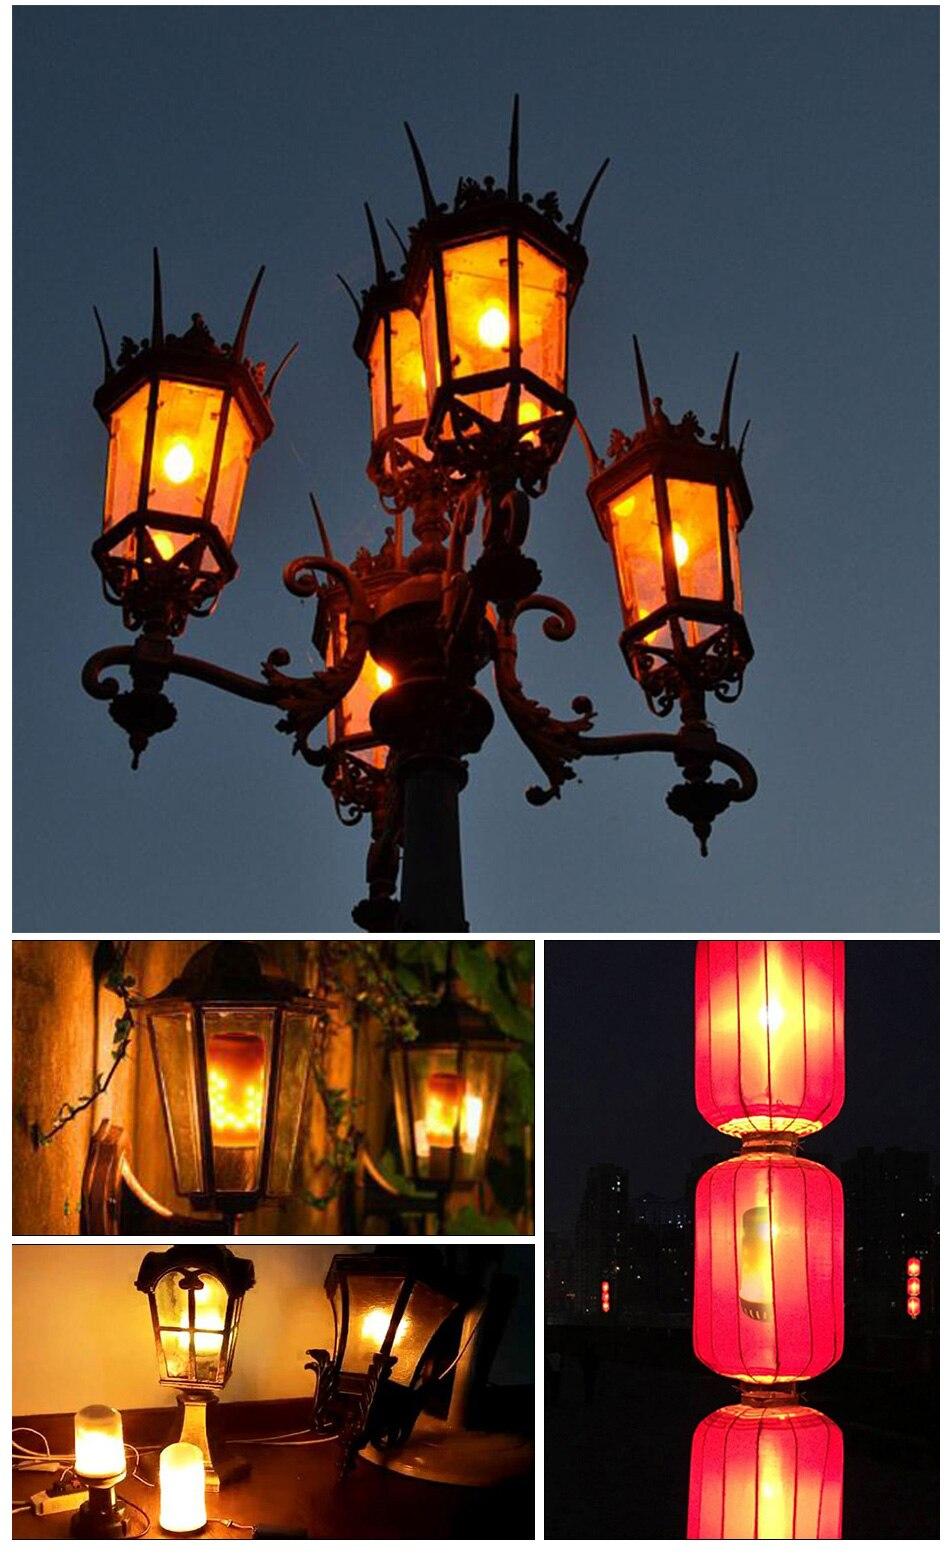 LED Flame Lamp Solar Waterproof Lawn Light Dancing Flickering Torch Lights Garden Outdoor Landscape Decorative Path Lighting (15)